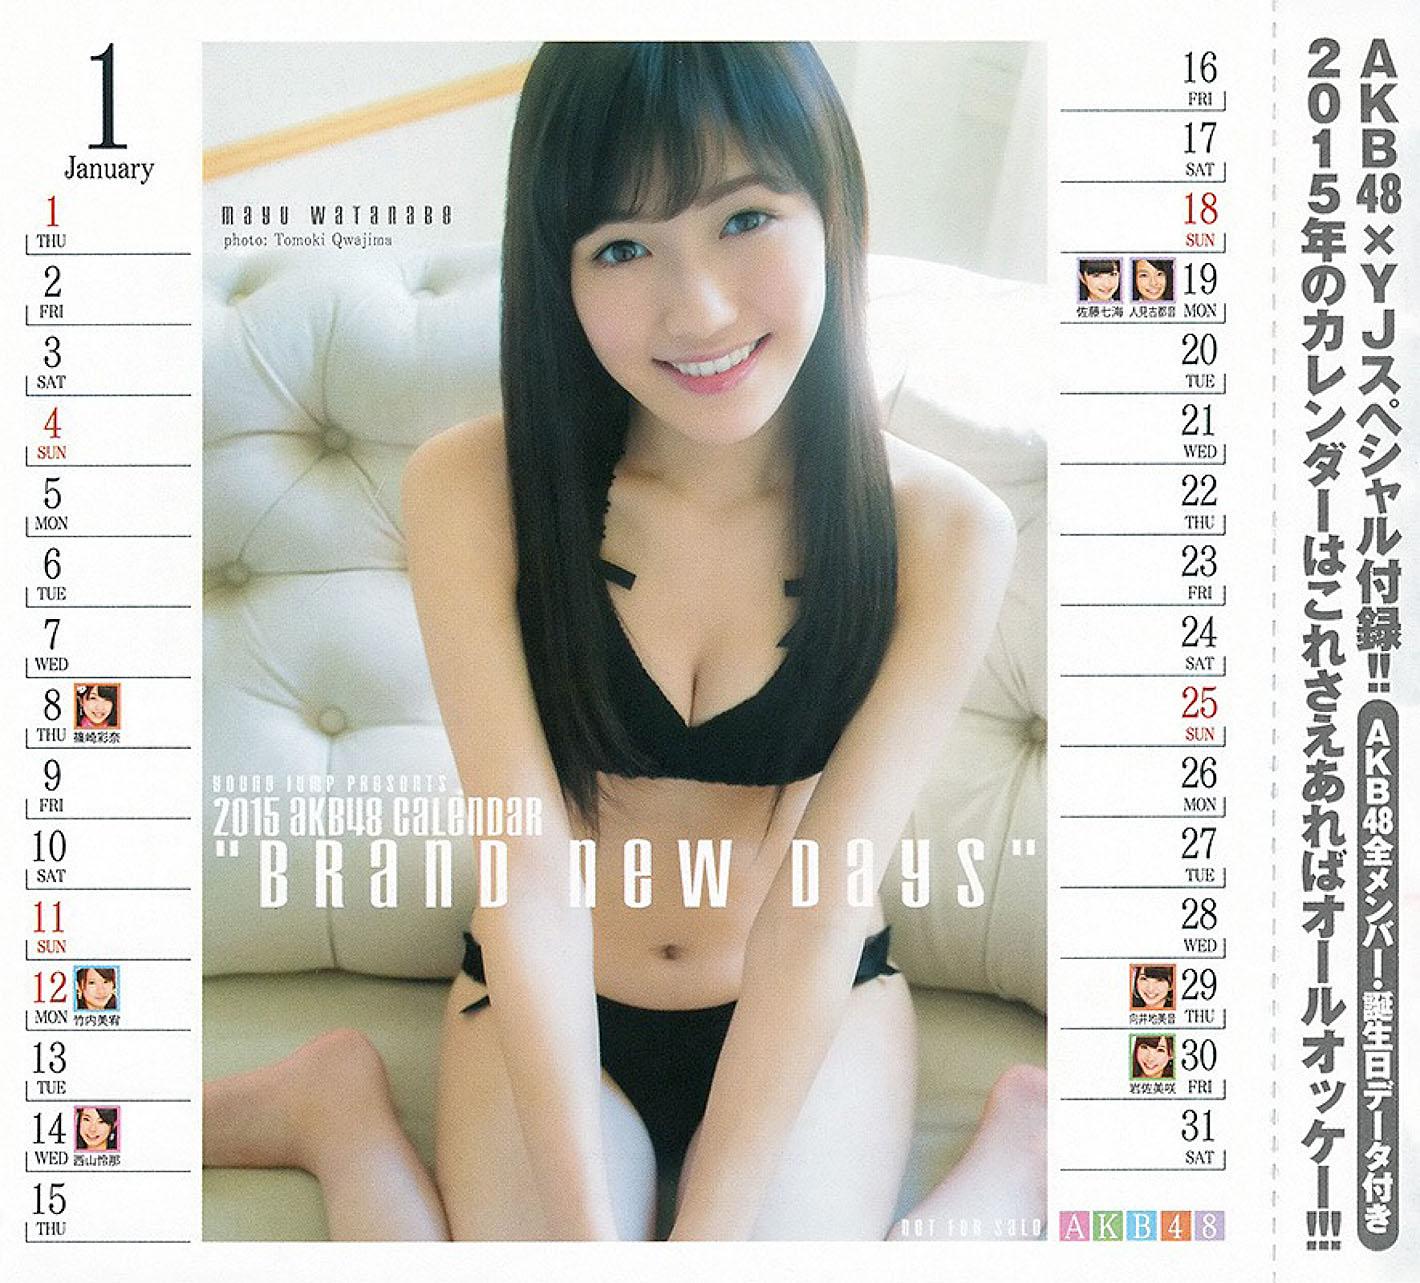 AKB48 Young Jump 141204 02.jpg